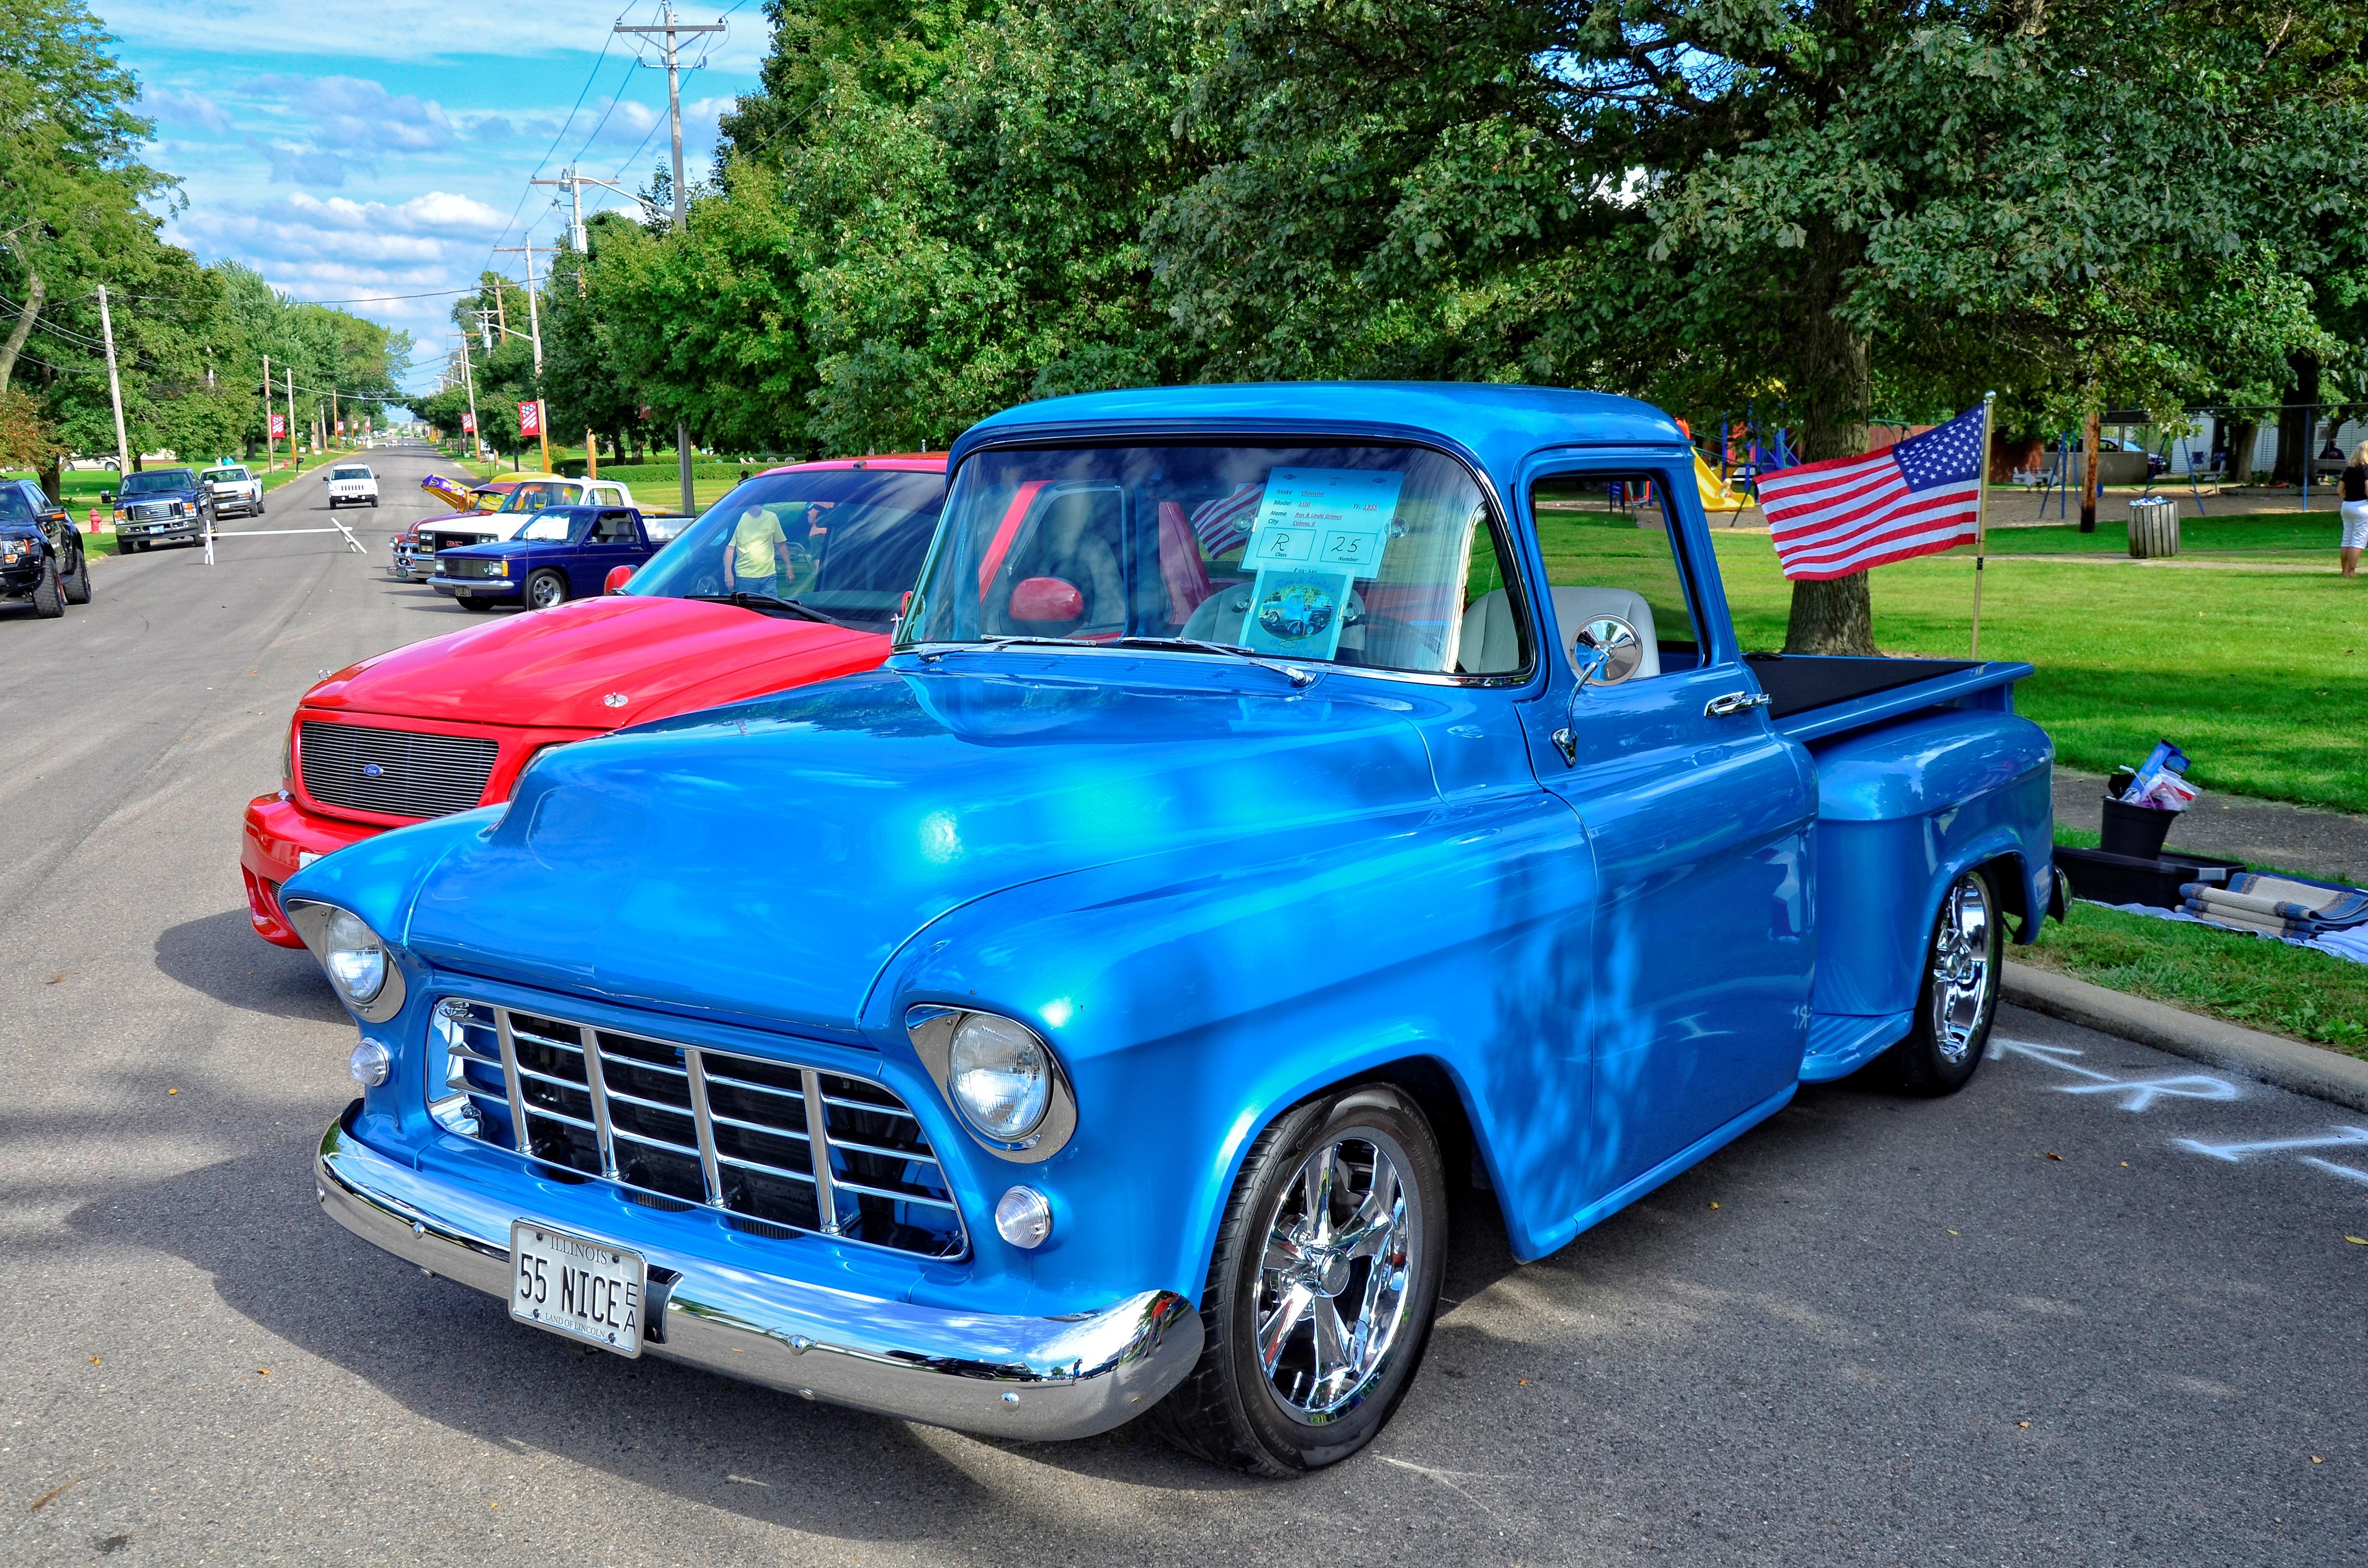 Th Annual Labor Day Weekend Car Show - Car show trophies dash plaques